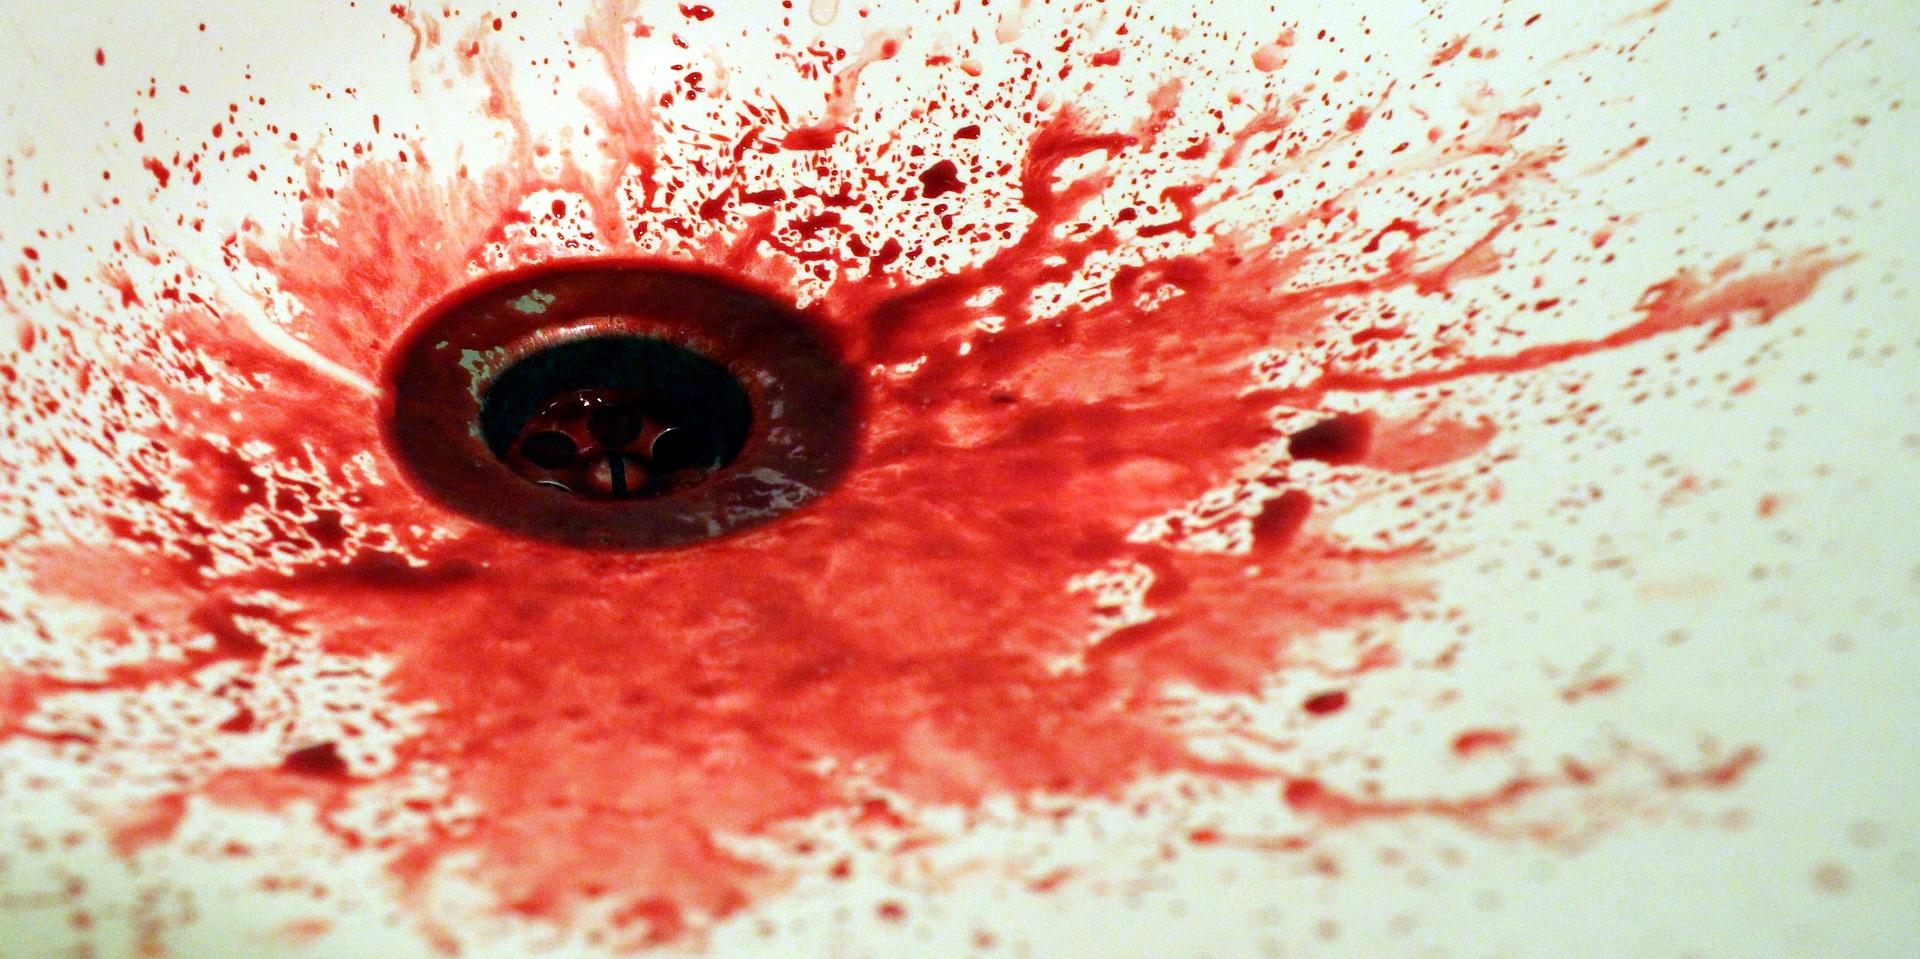 blood-1715010_1920.jpg